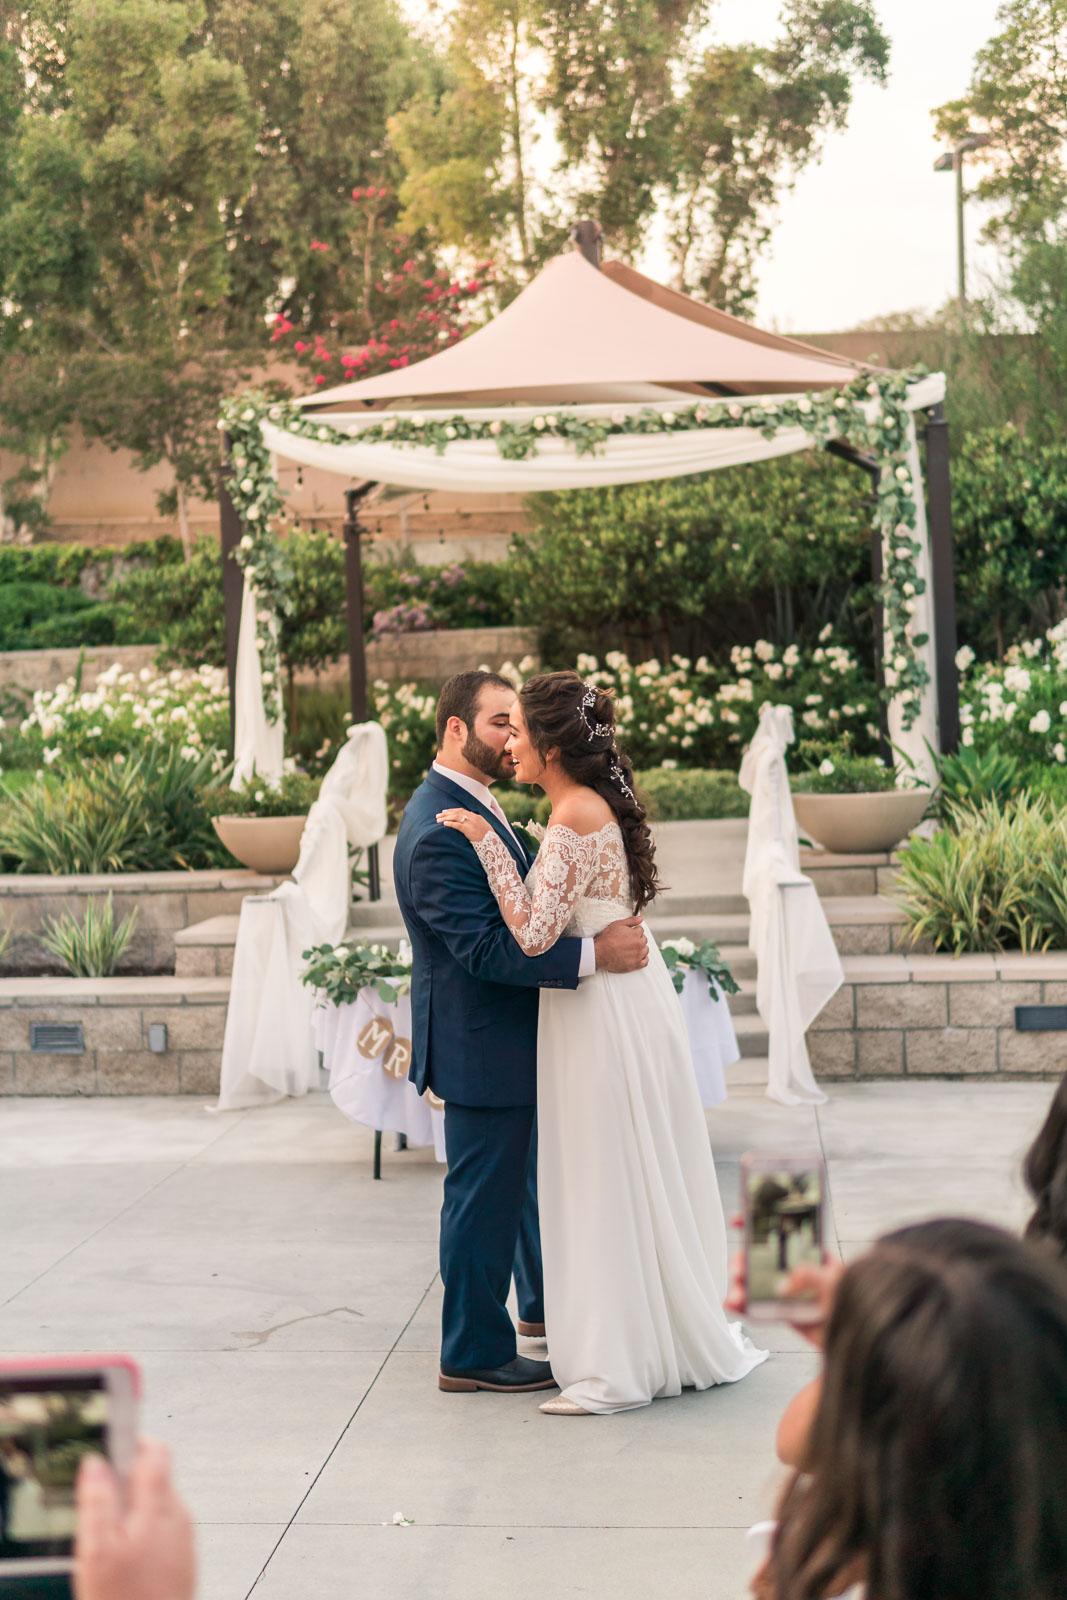 345_Angel-Brea-Orange-County_Joseph-Barber-Wedding-Photography.jpg